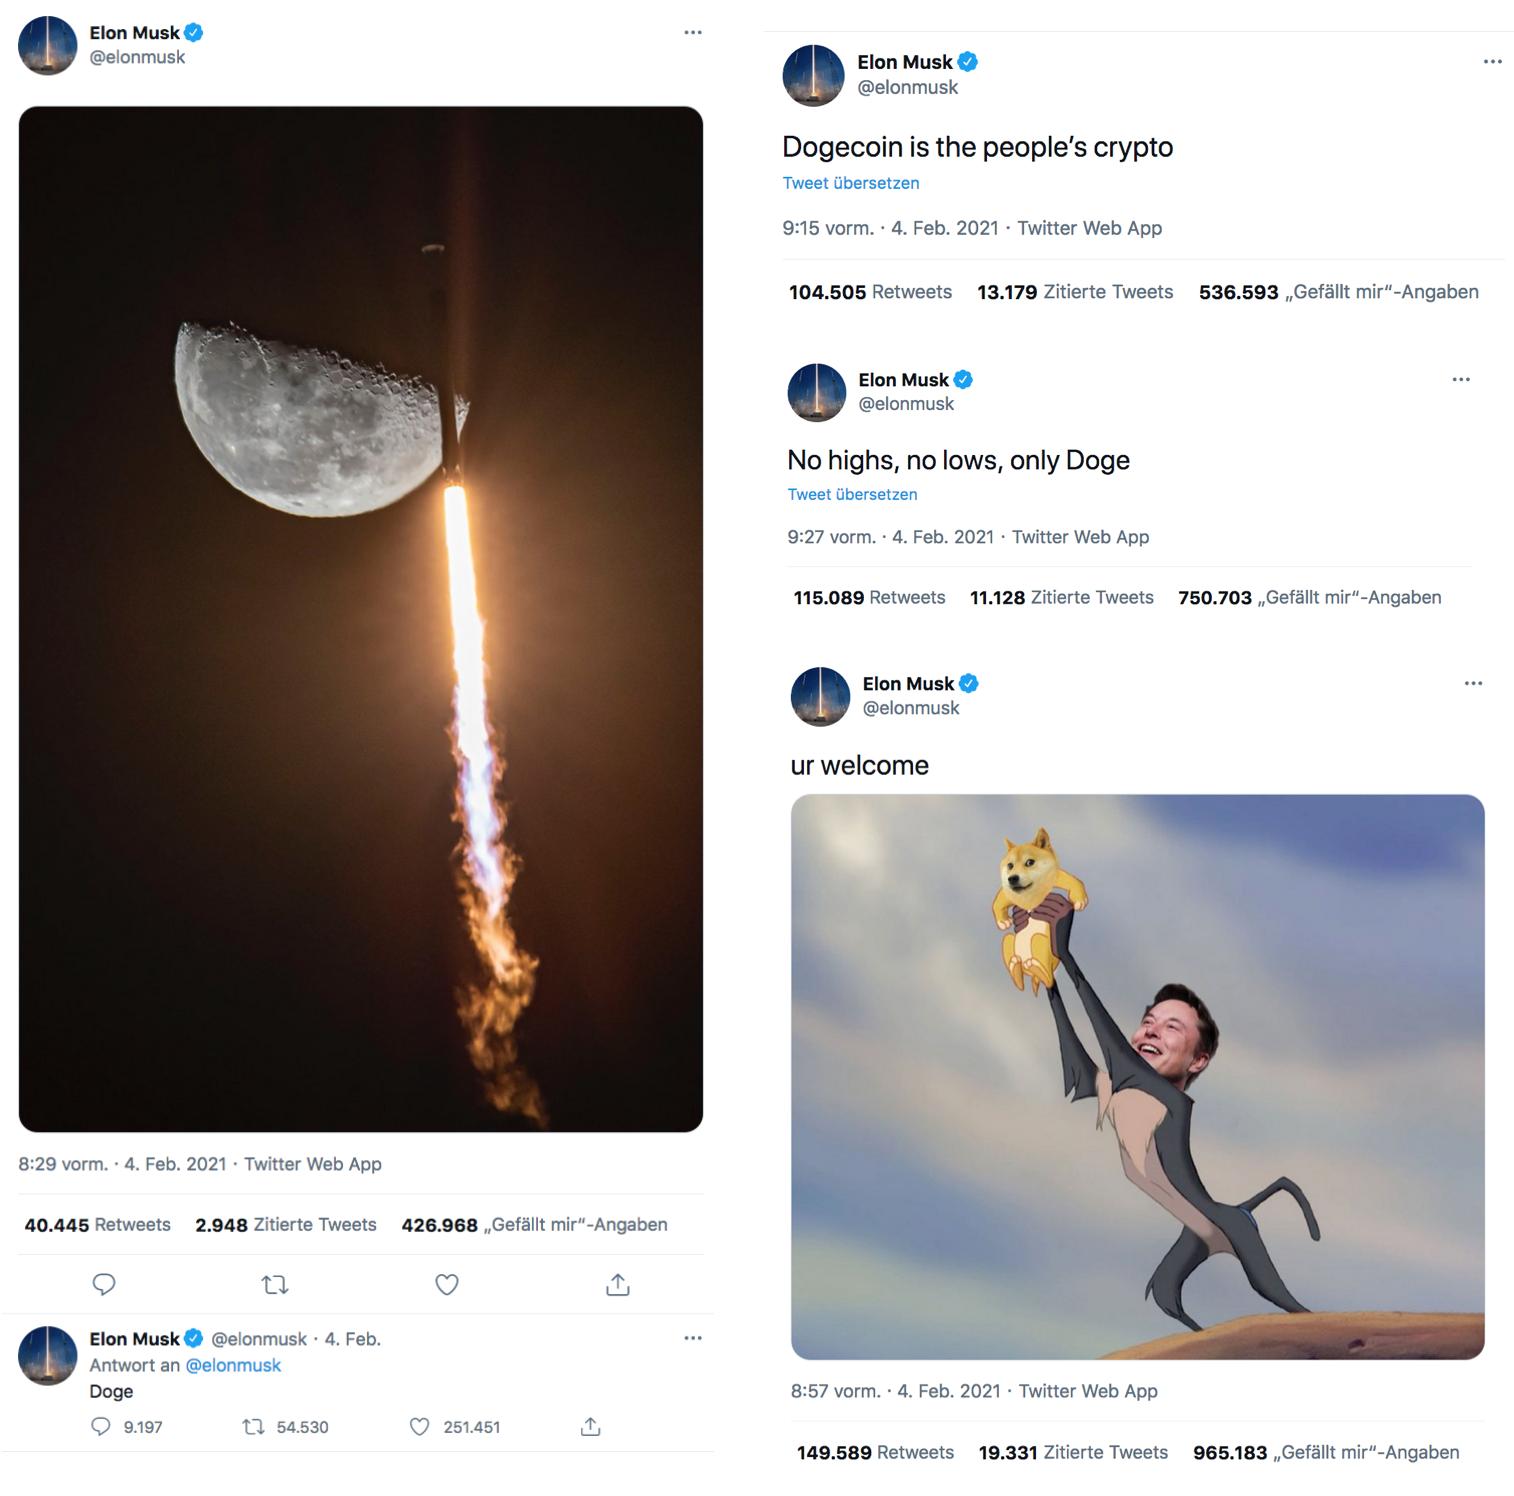 Causal effect of Elon Musk tweets on Dogecoin price   Fabian Dablander